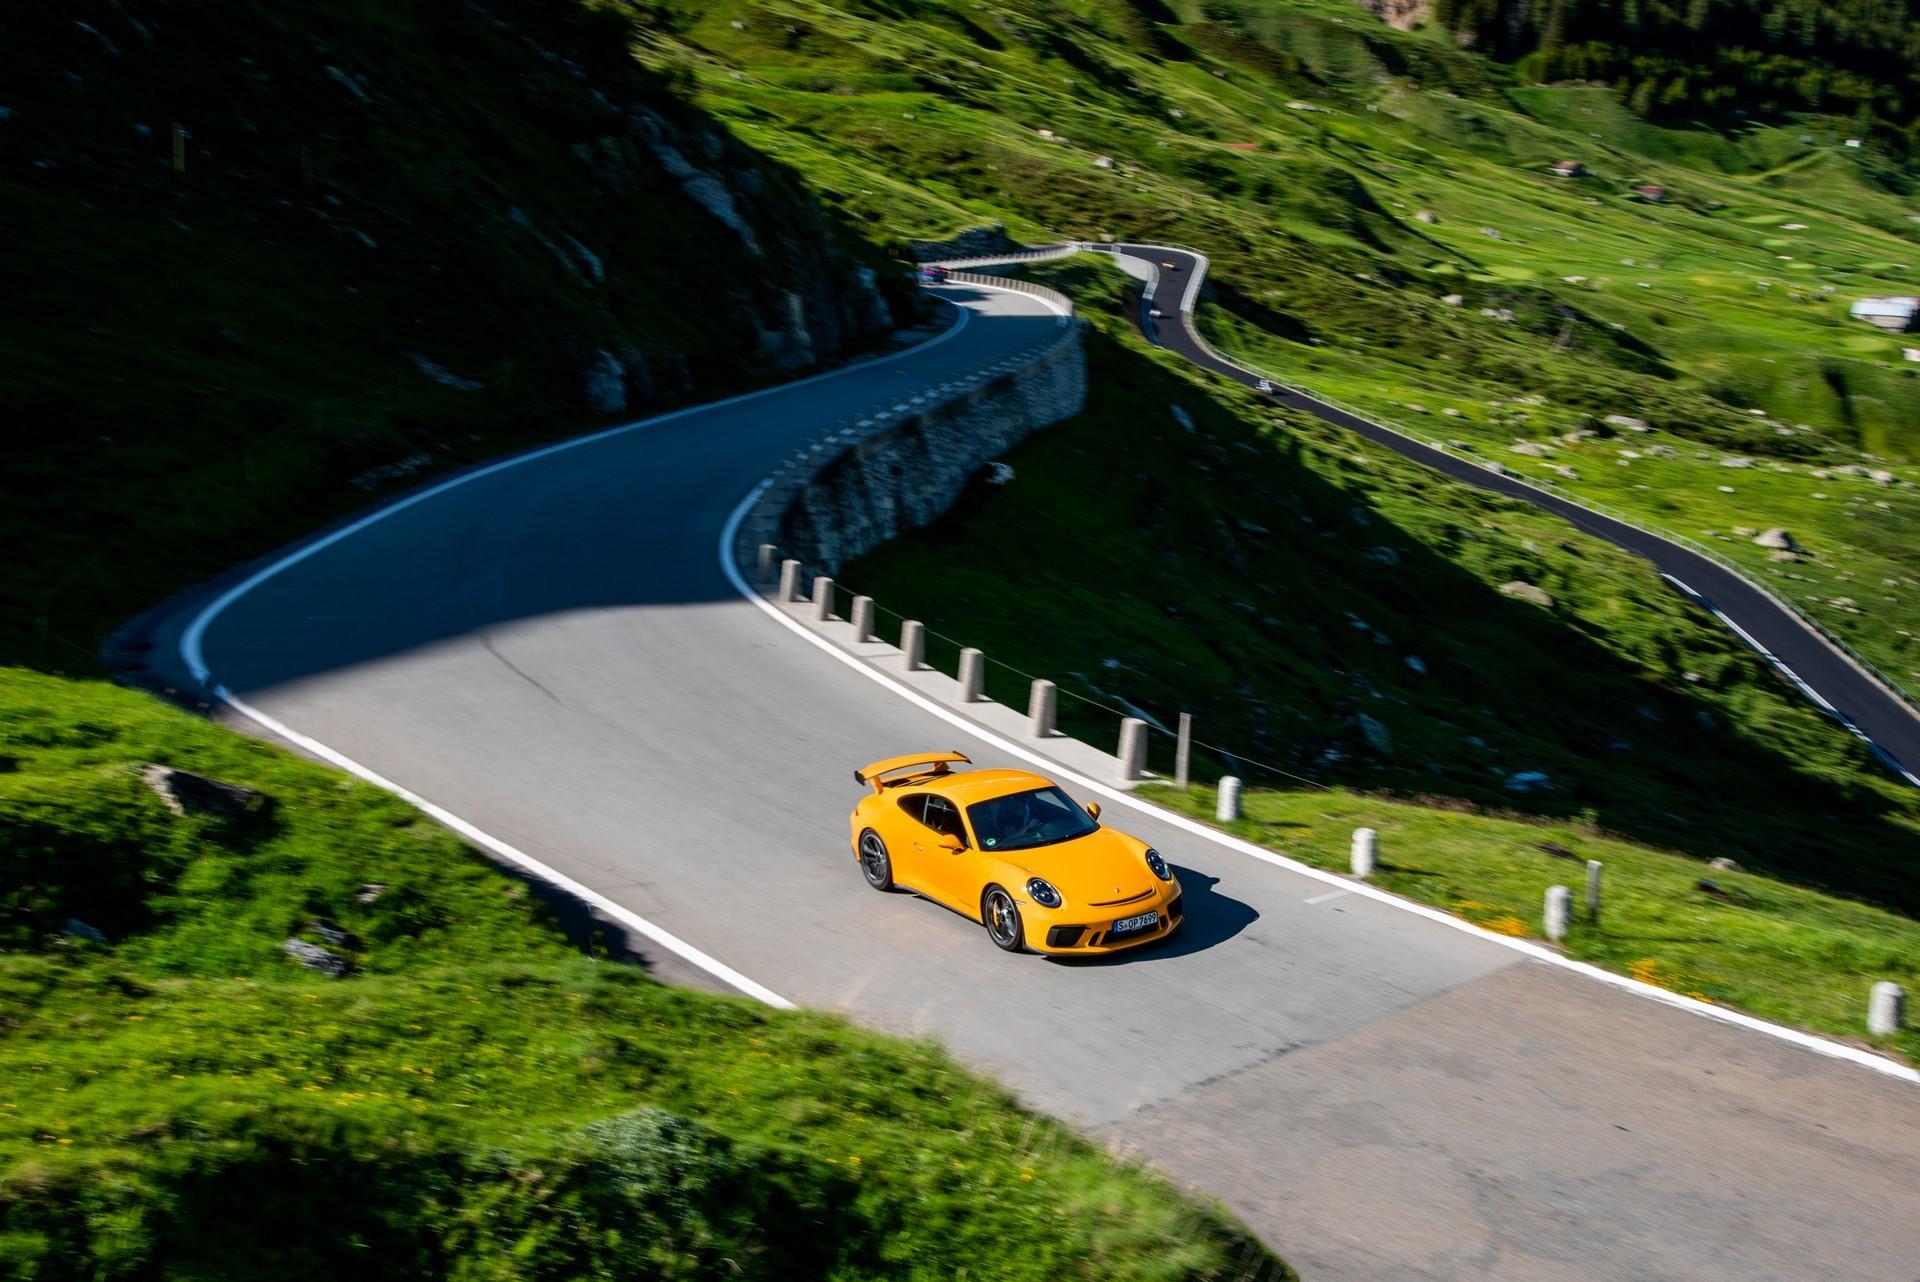 20-years-of-the-Porsche-911-GT3-35